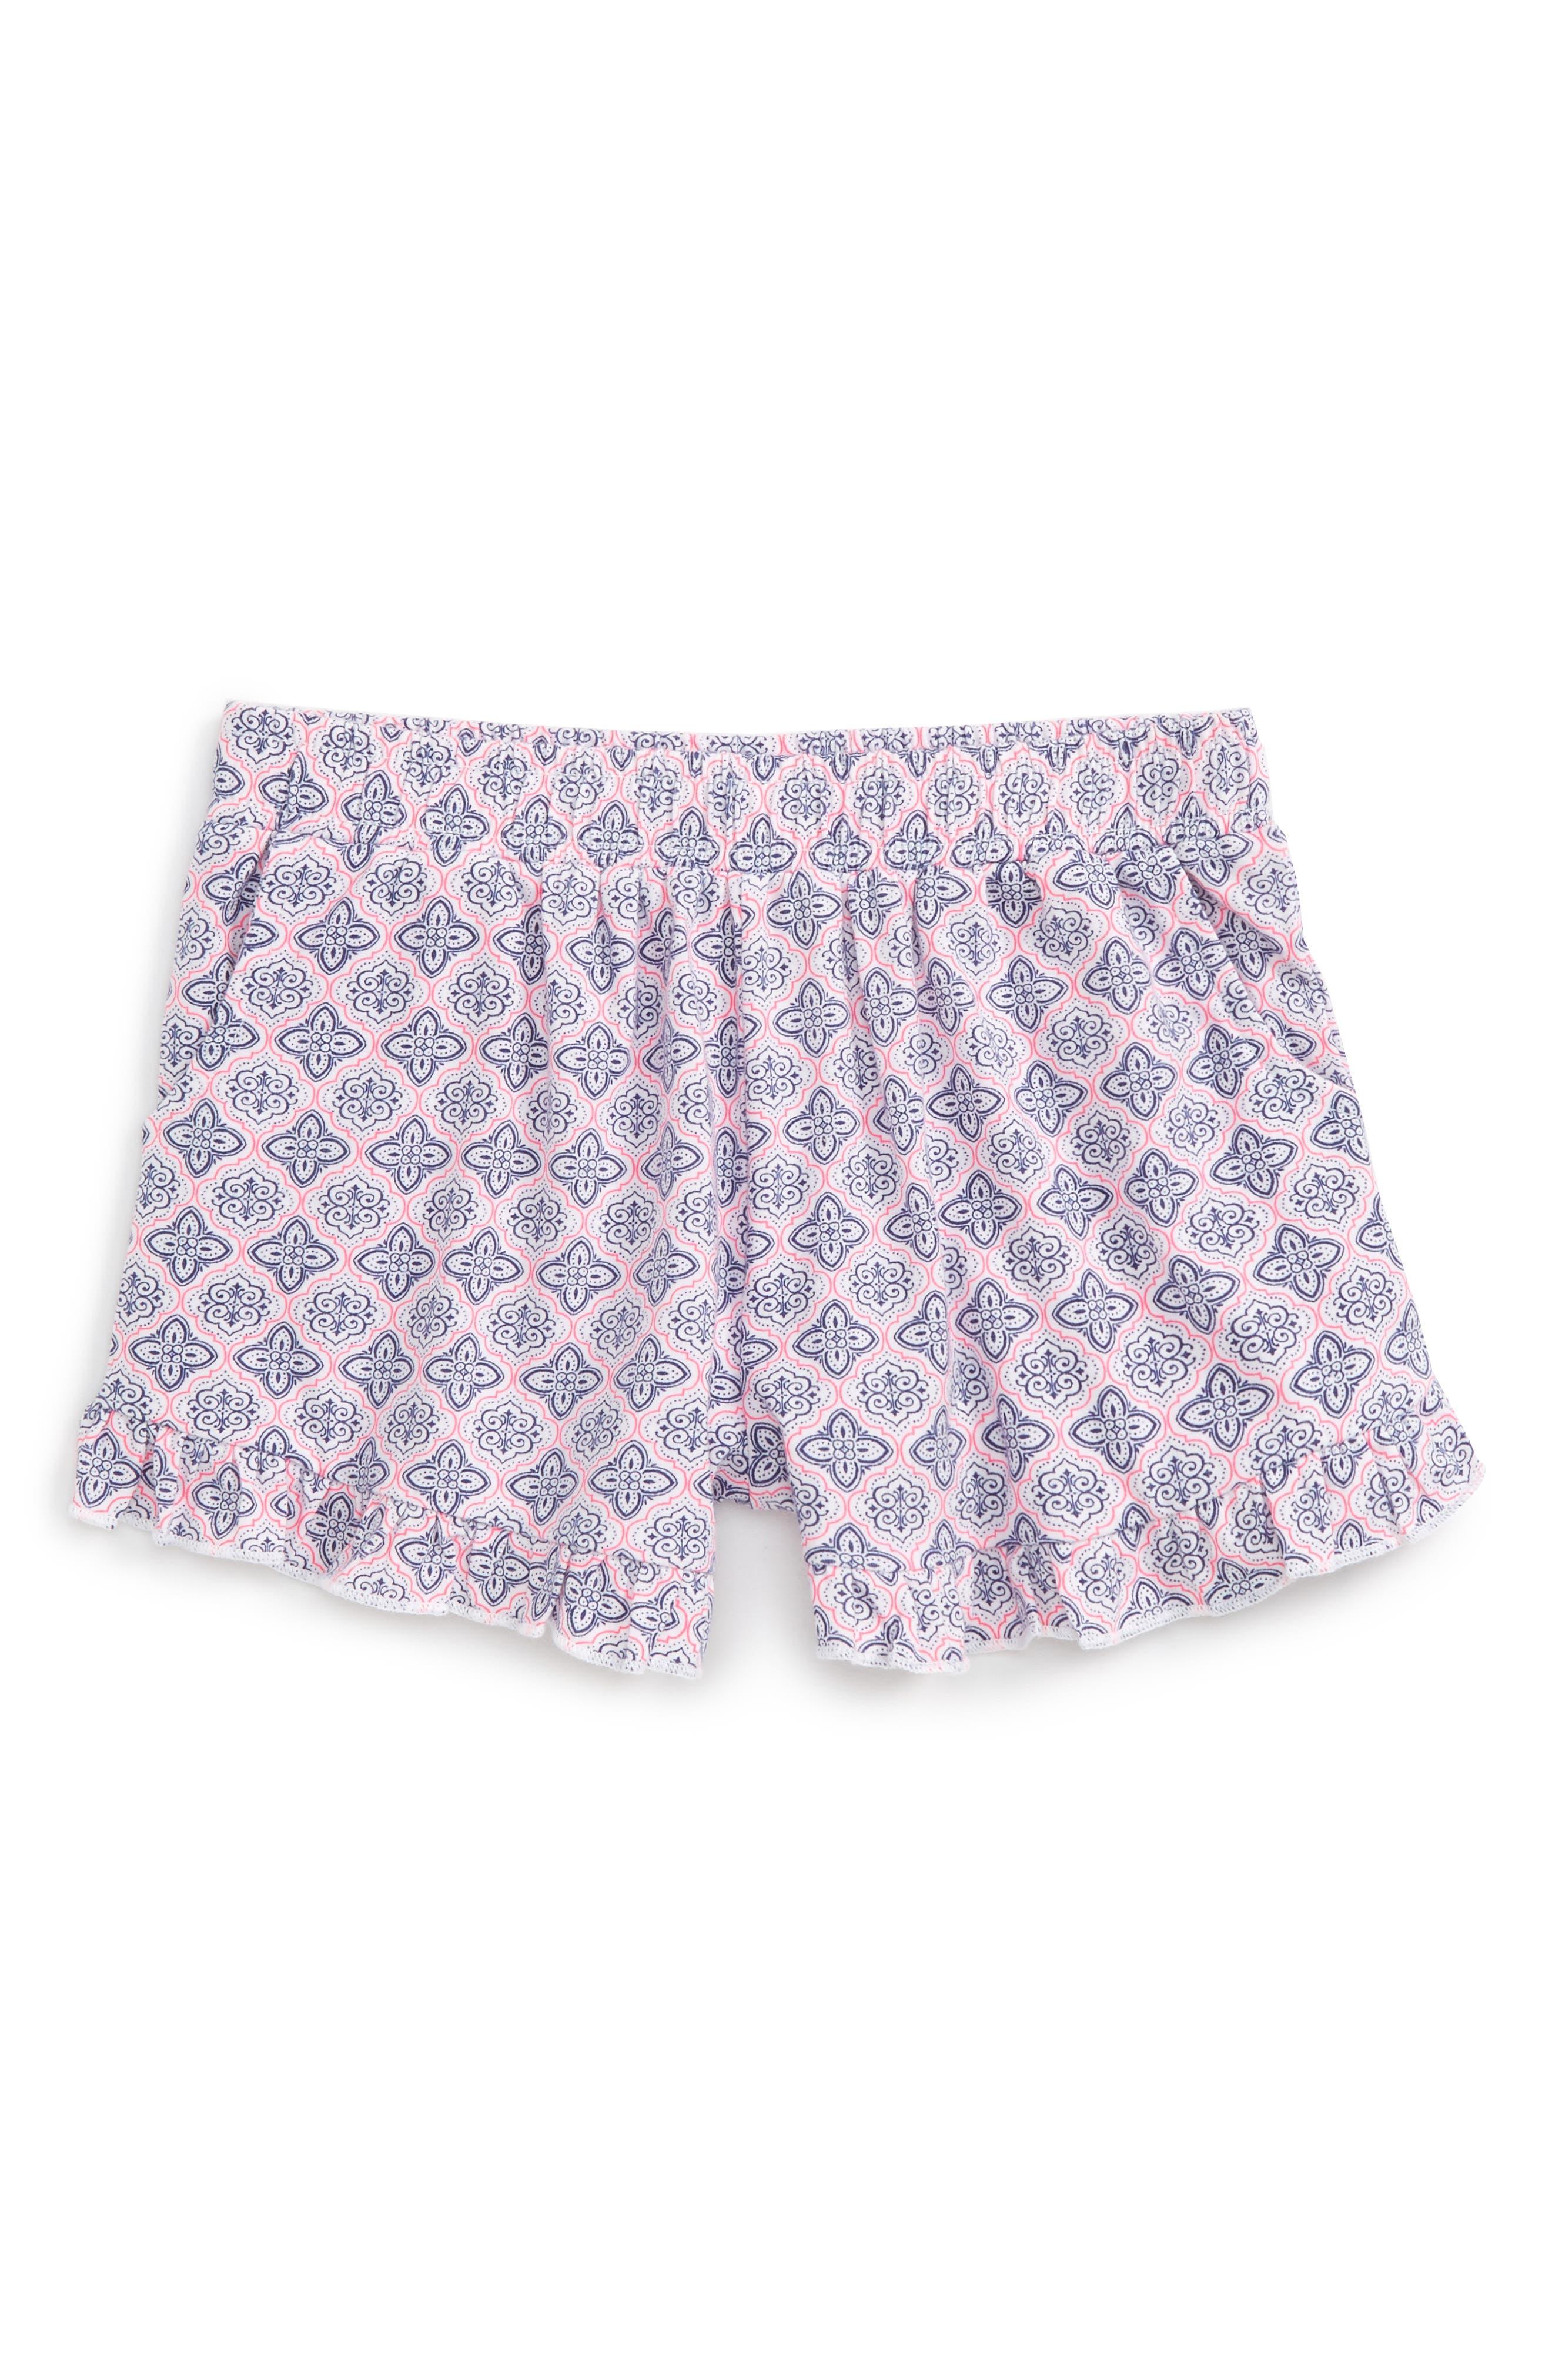 Tucker + Tate Print Ruffle Shorts (Toddler Girls, Little Girls & Big Girls)